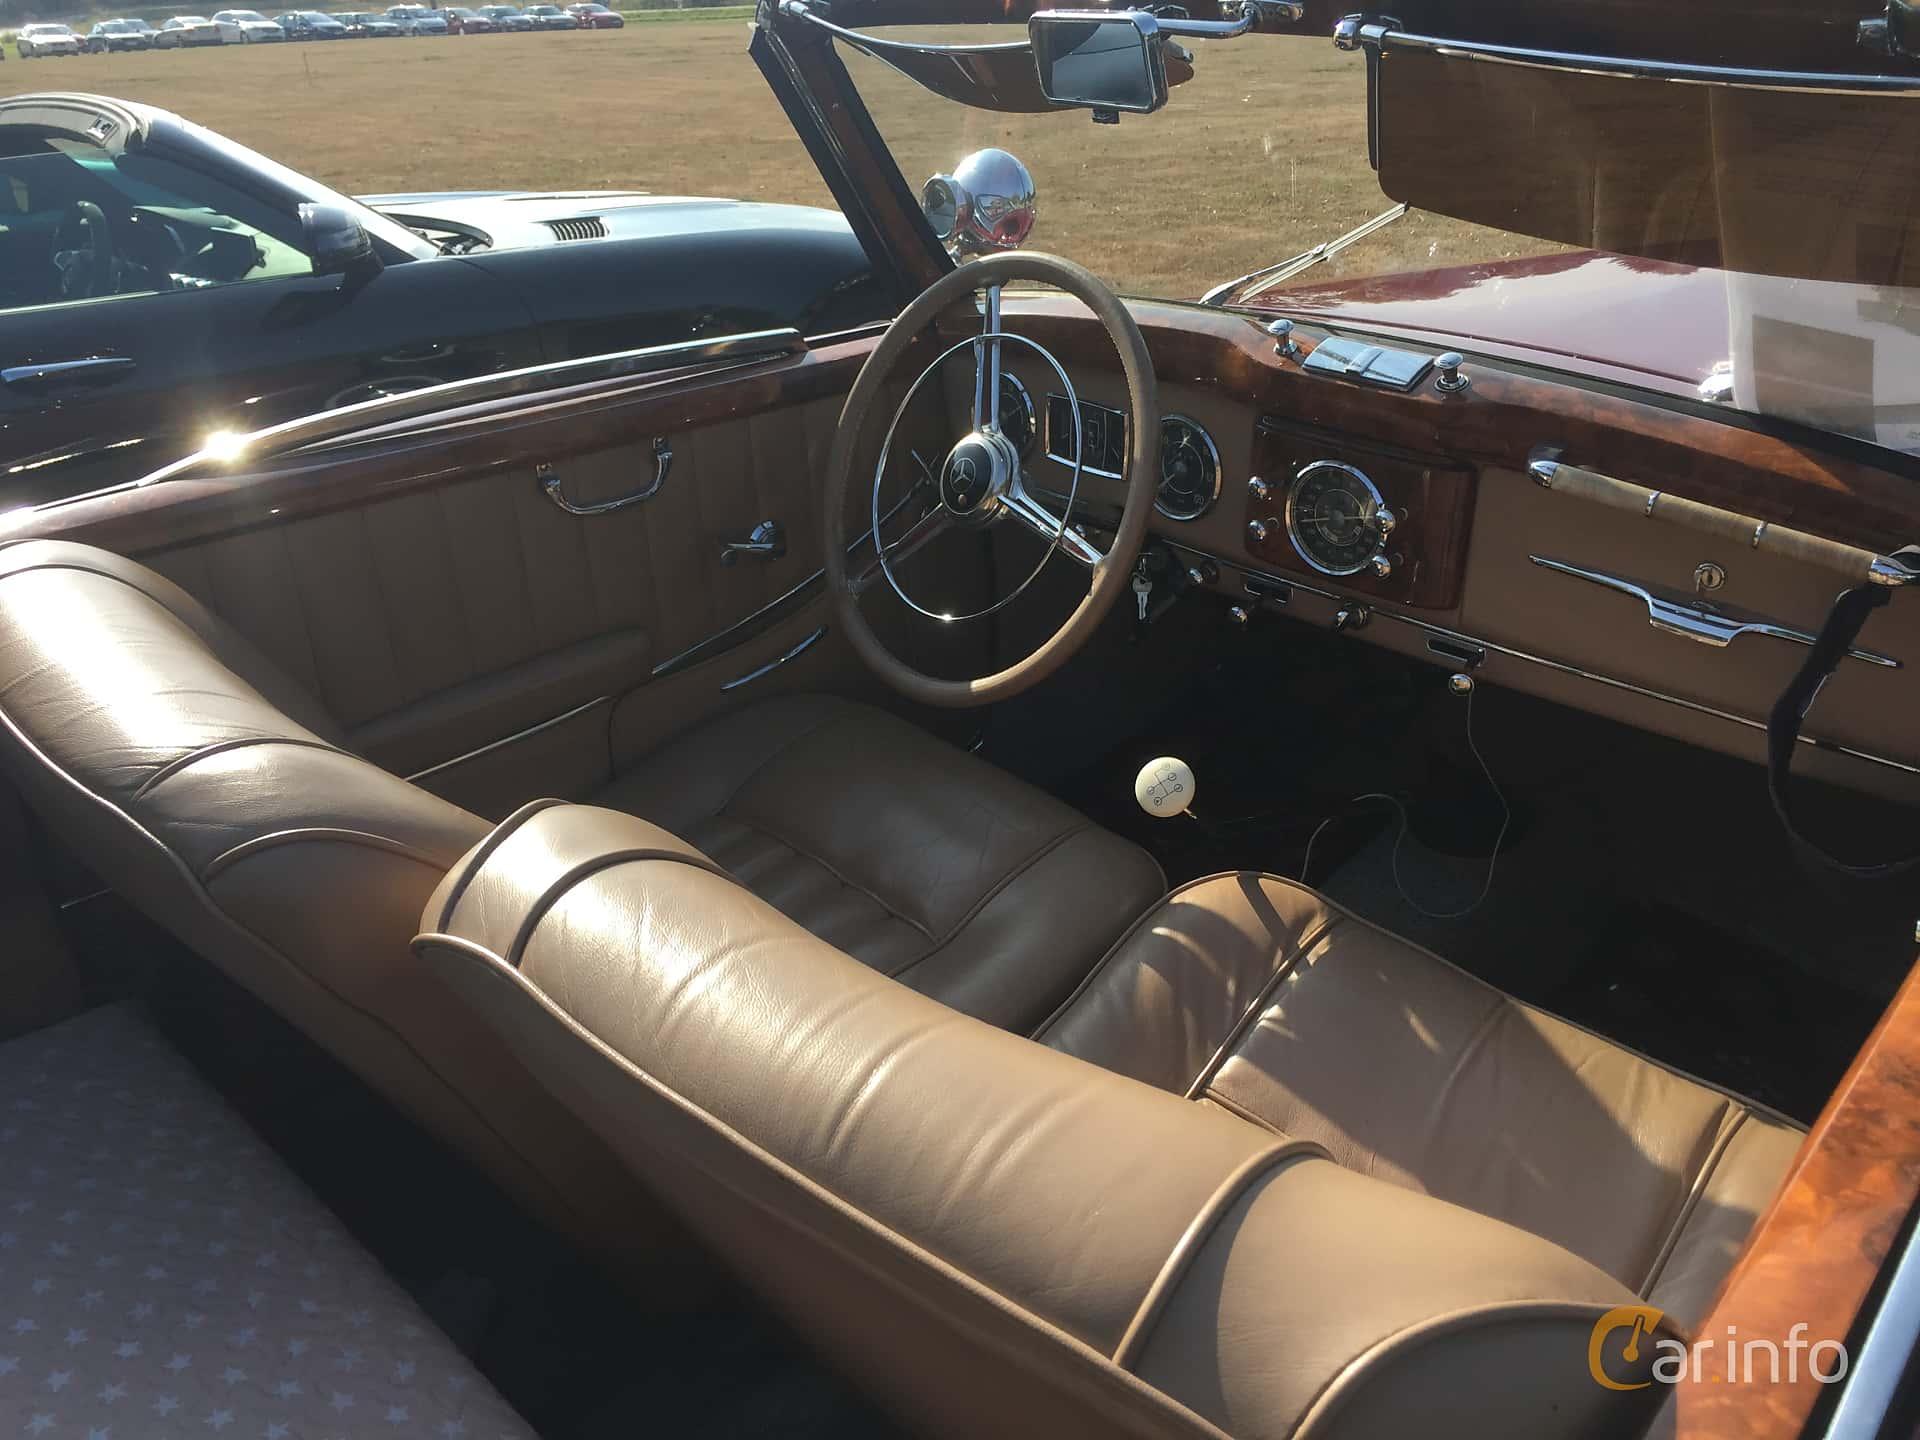 Mercedes-Benz 170 S Cabriolet A  Manual, 52hp, 1950 at Eddys bilträff Augusti 2018